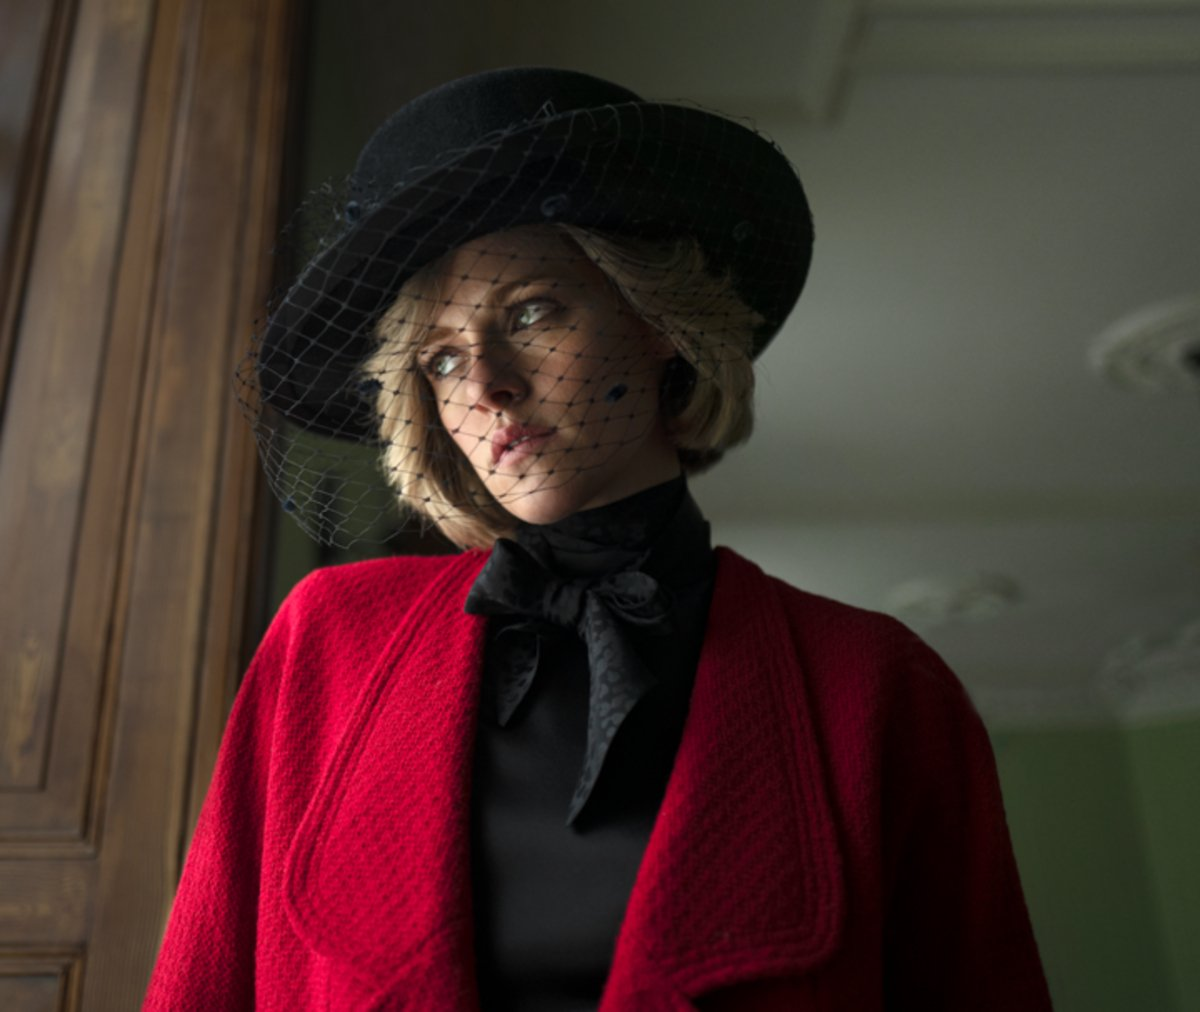 Spencer Kristen Stewart as Princess Diana